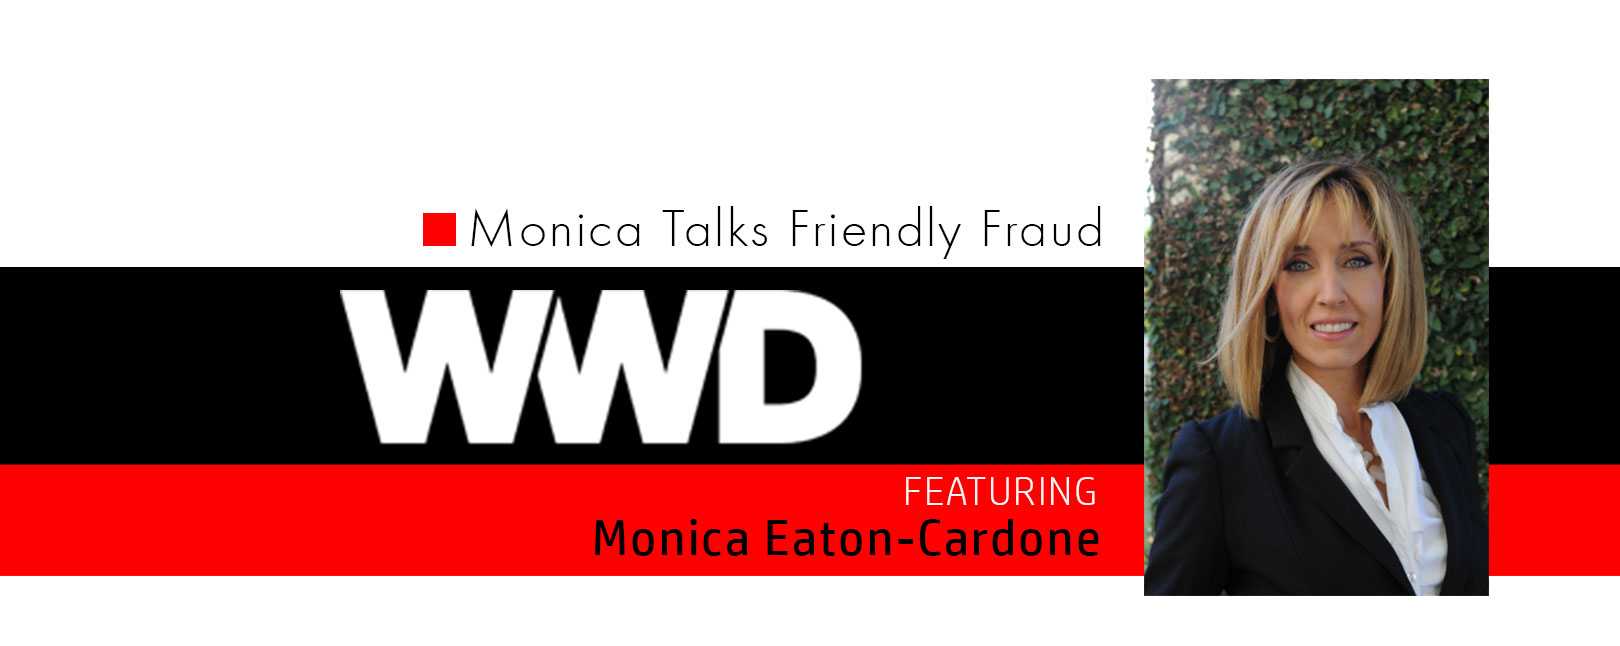 monica talks friendly fraud